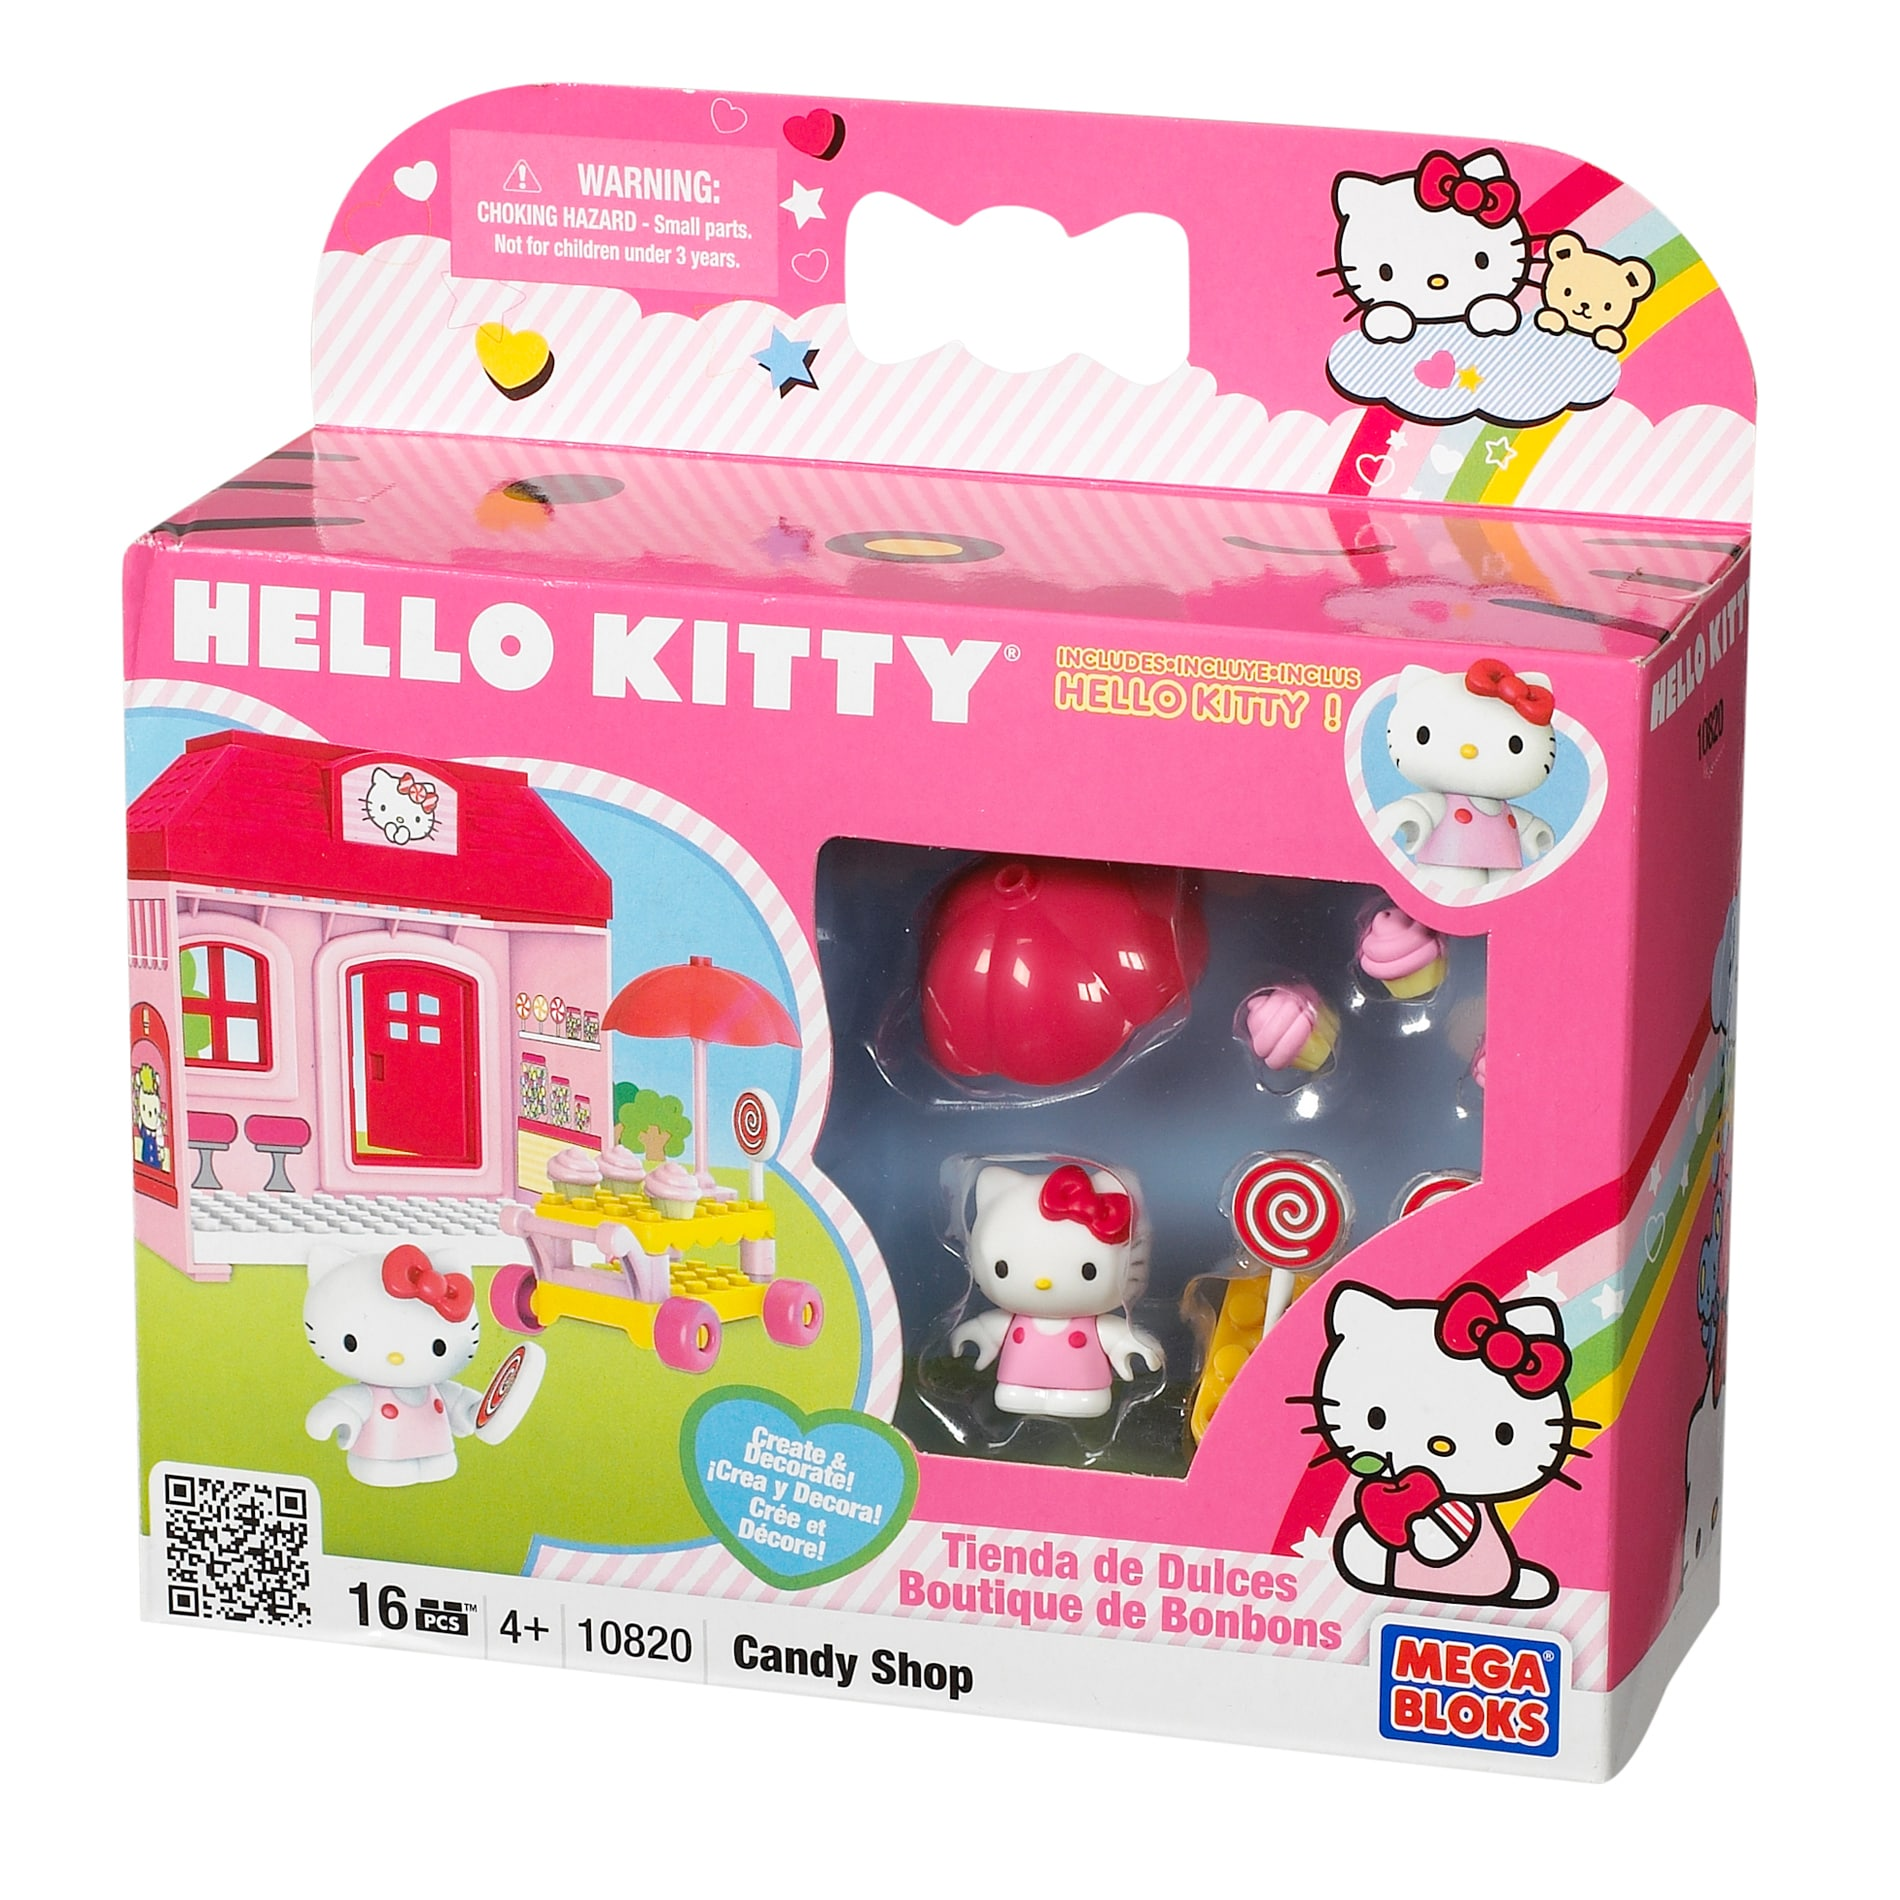 Mega Bloks Hello Kitty Candy Store Play Set